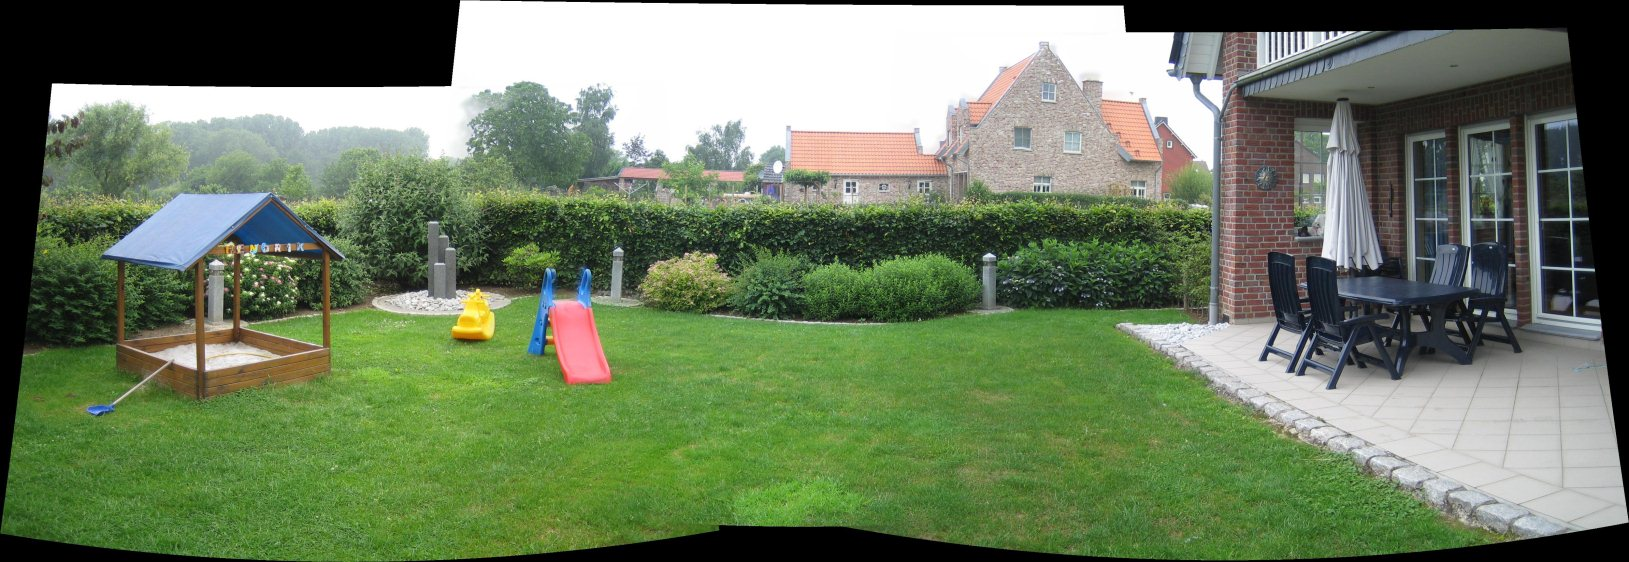 Familiengarten durch moderne gestaltung aufwerten for Gartengestaltung 150 qm